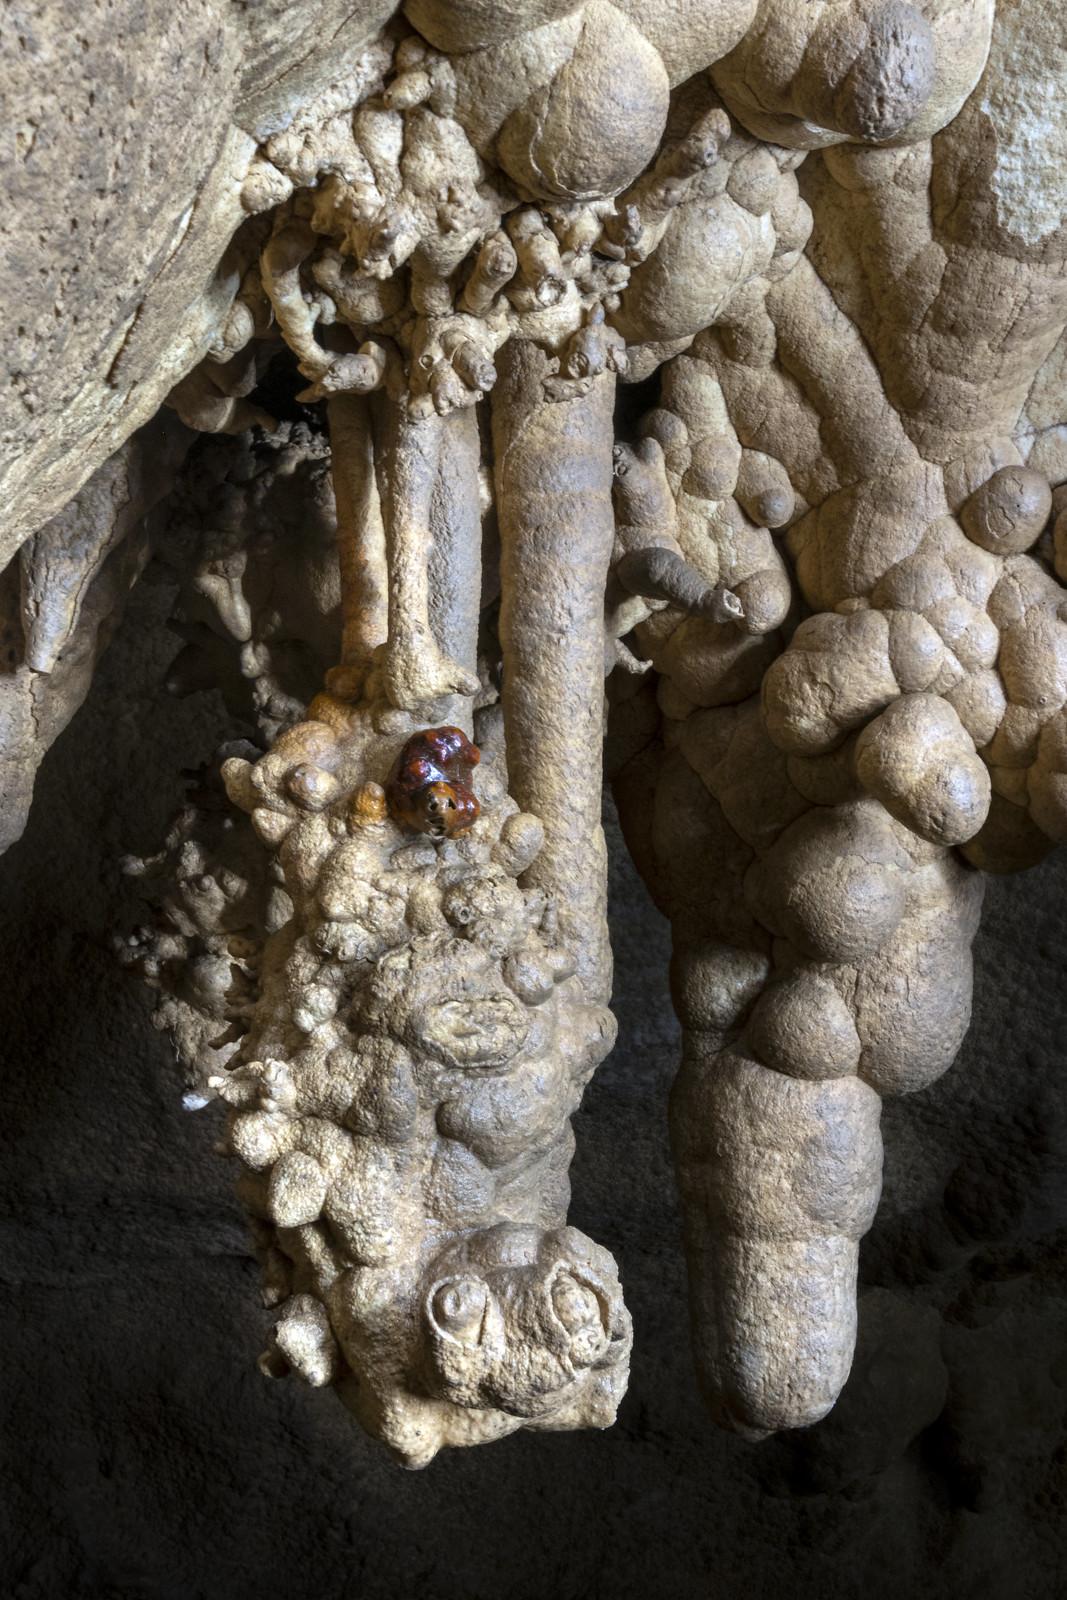 Helictites, Fern Cave, Jackson County, Alabama 5